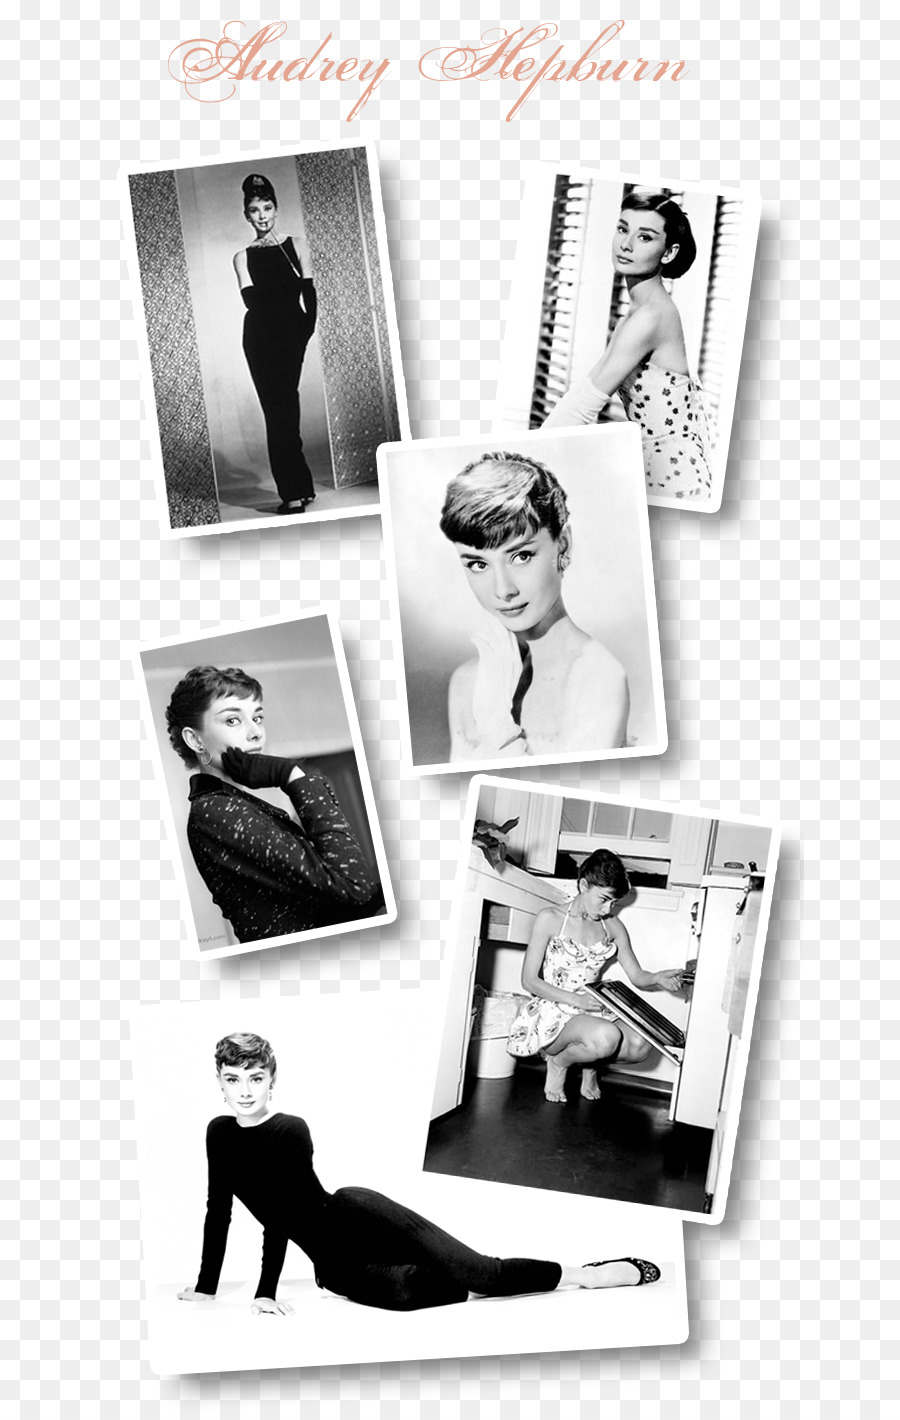 Paper Picture Frames - audrey hepburn png download - 709*1417 - Free ...